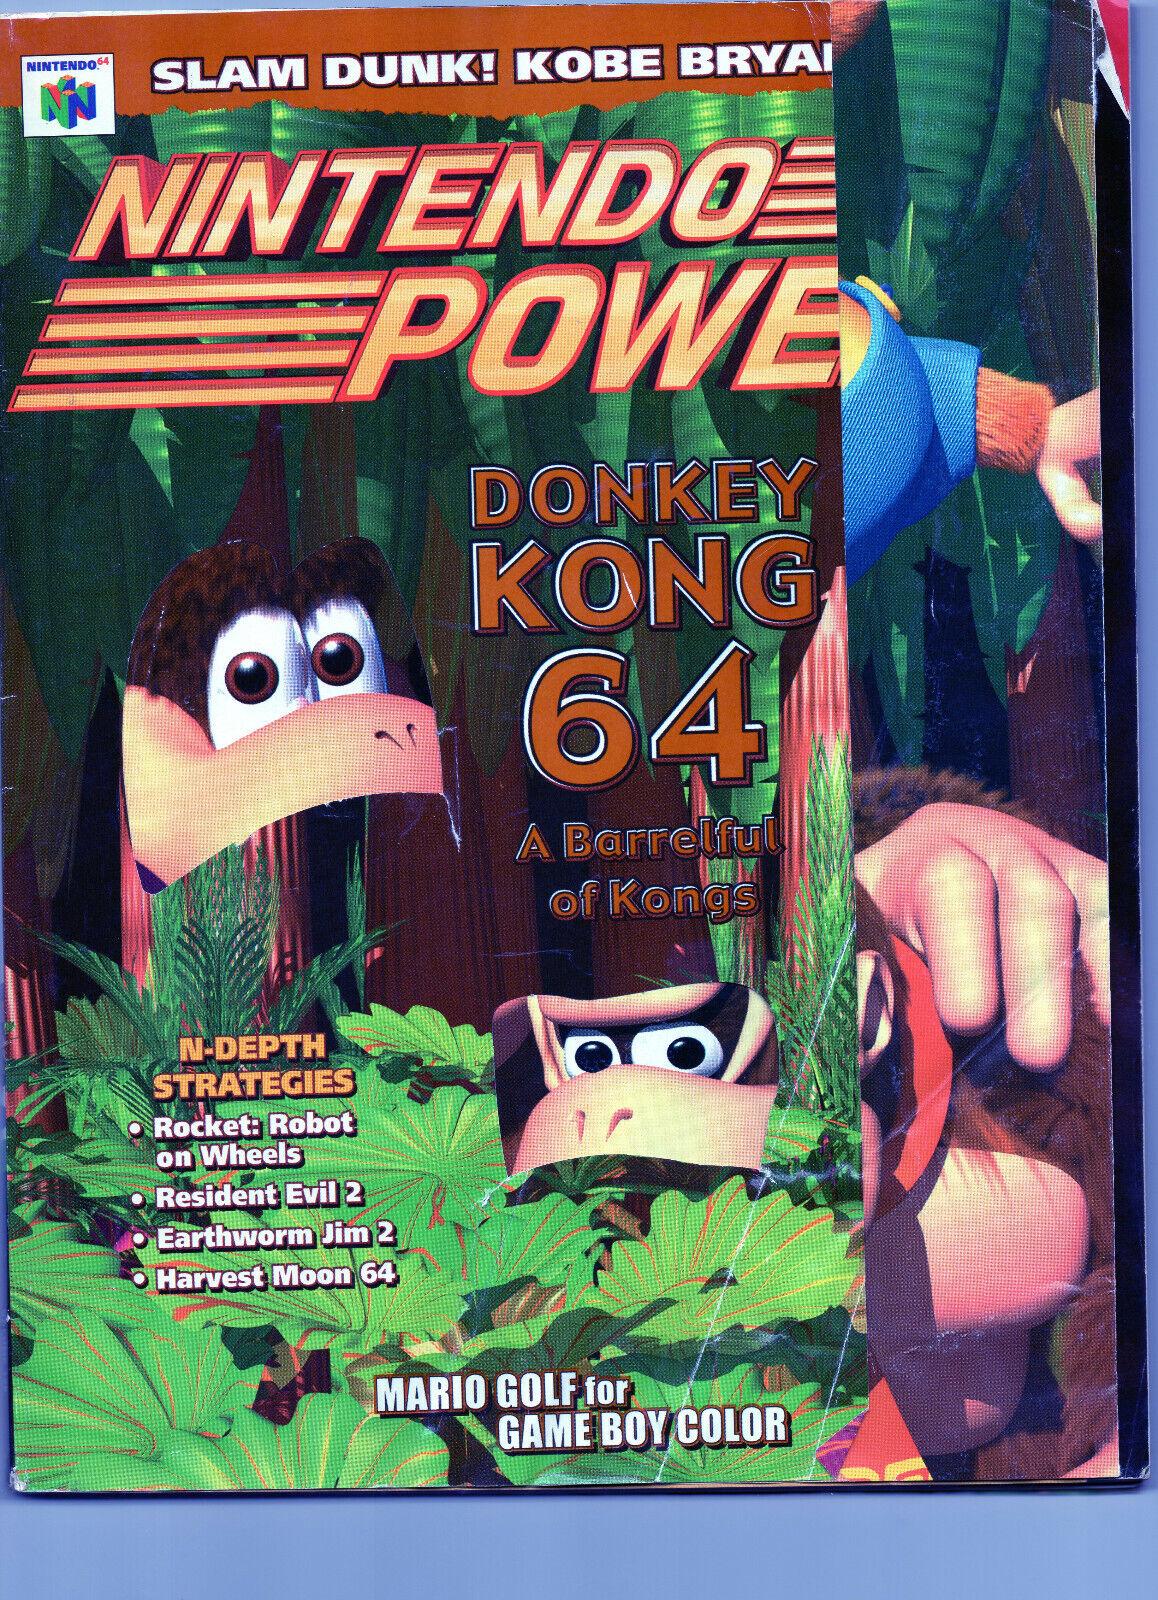 Nintendo Power Donkey Kong 64 Vol 126. Includes Kobe Bryant Poster Pokemon Comic - $12.00